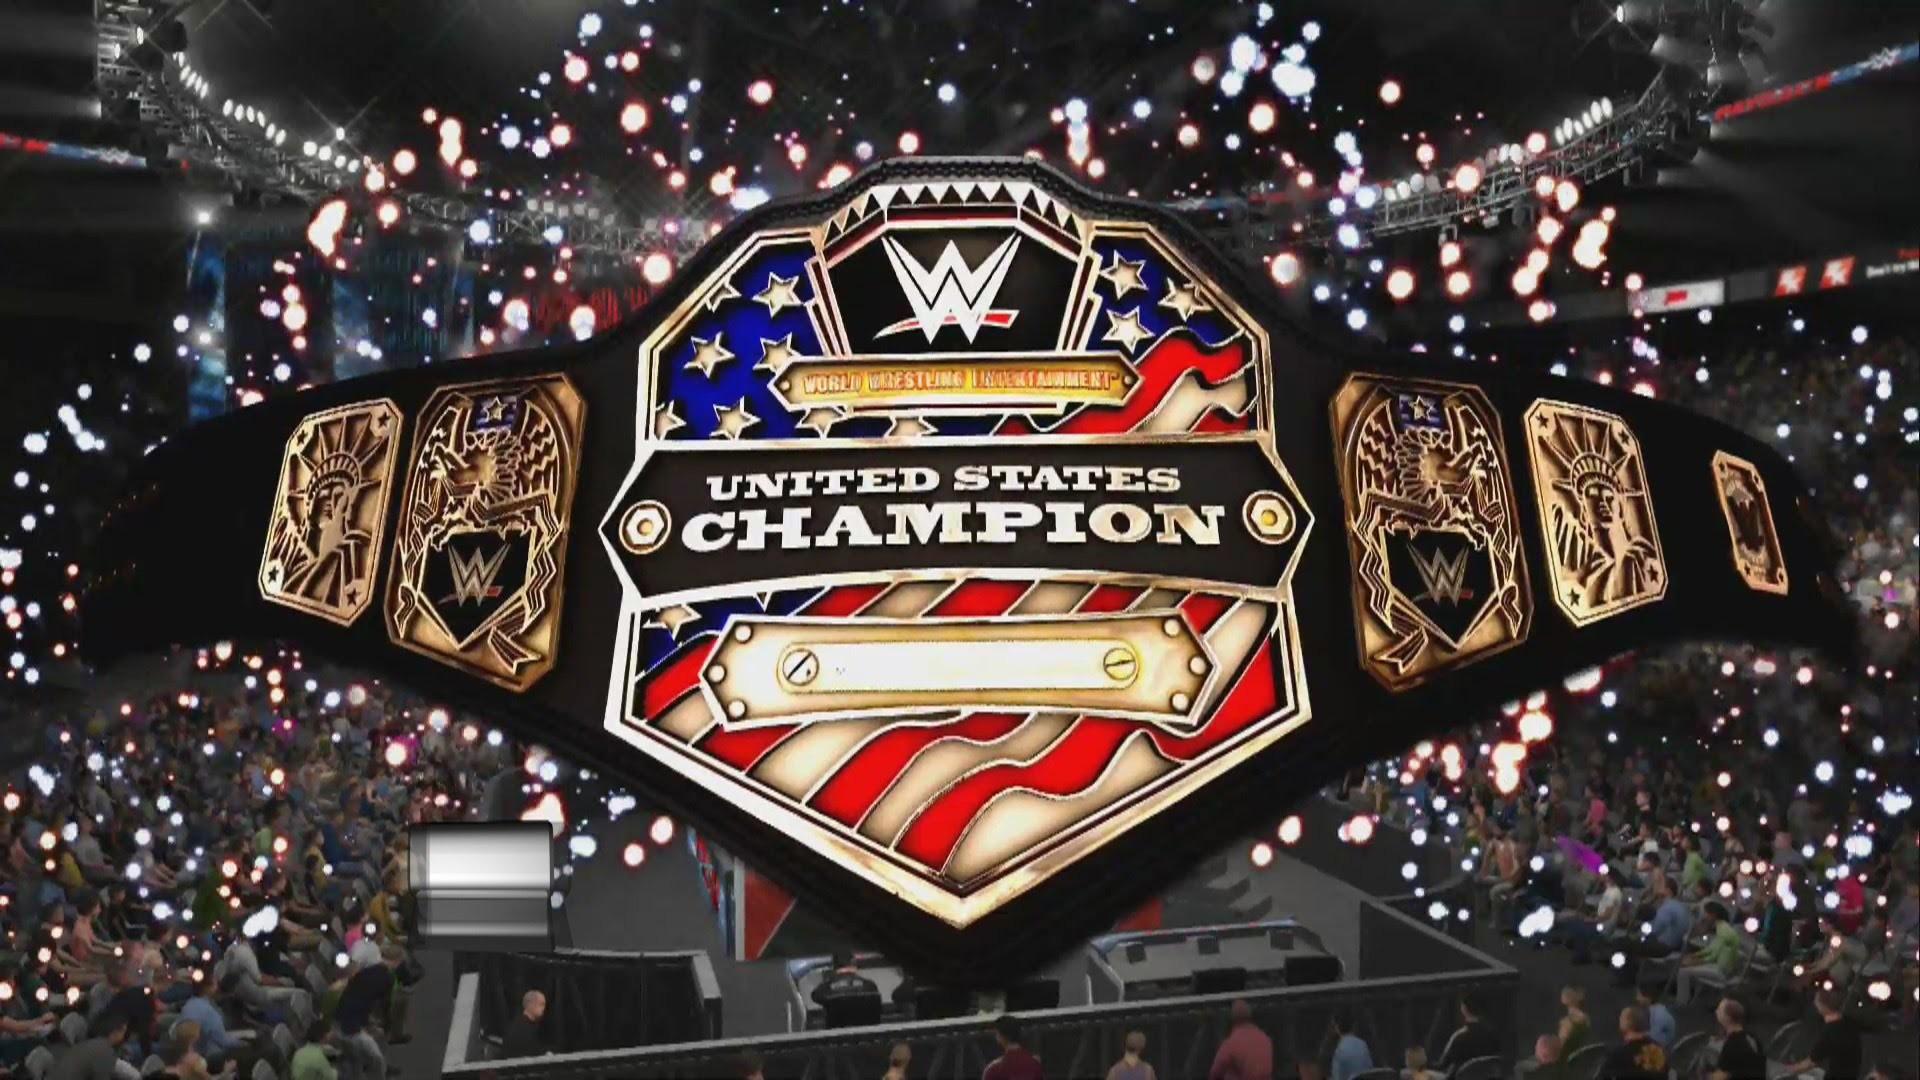 1920x1080 WWE Payback 2016 Predictions Kalisto vs Ryback WWE United States Championship(WWE 2K16)